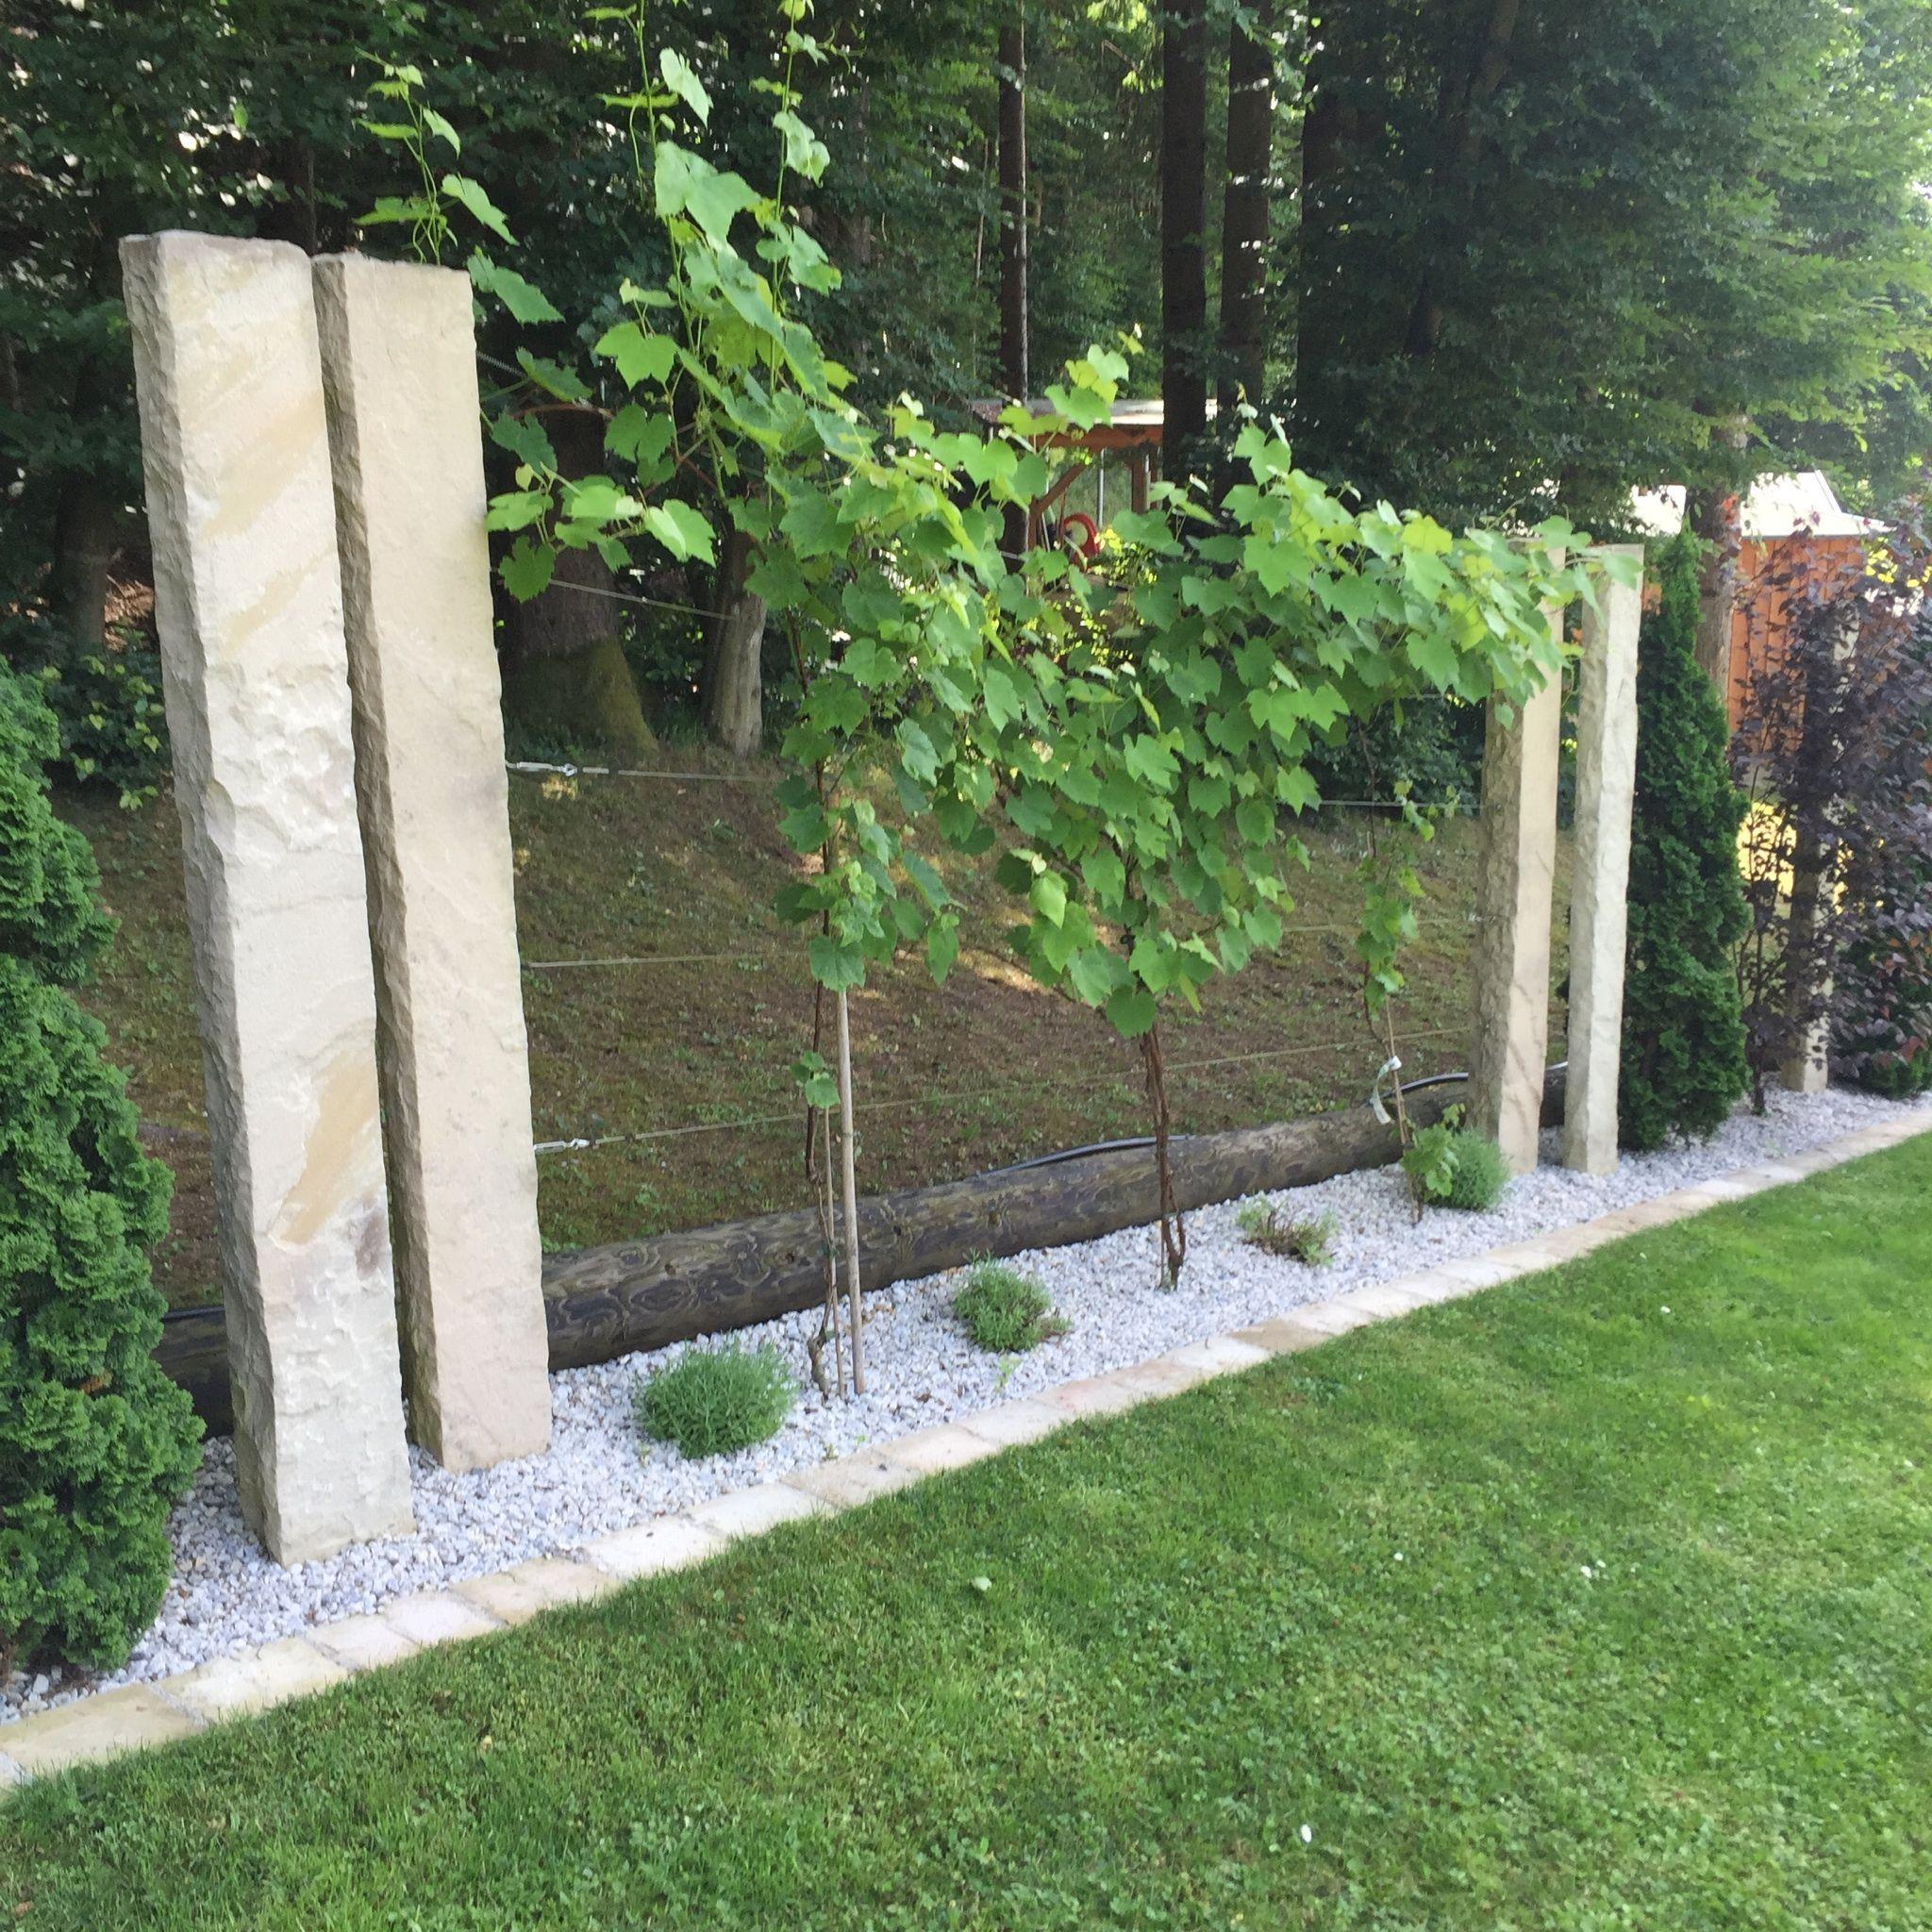 Weinreben Unsereunsere Weinreben Garten Bepflanzung